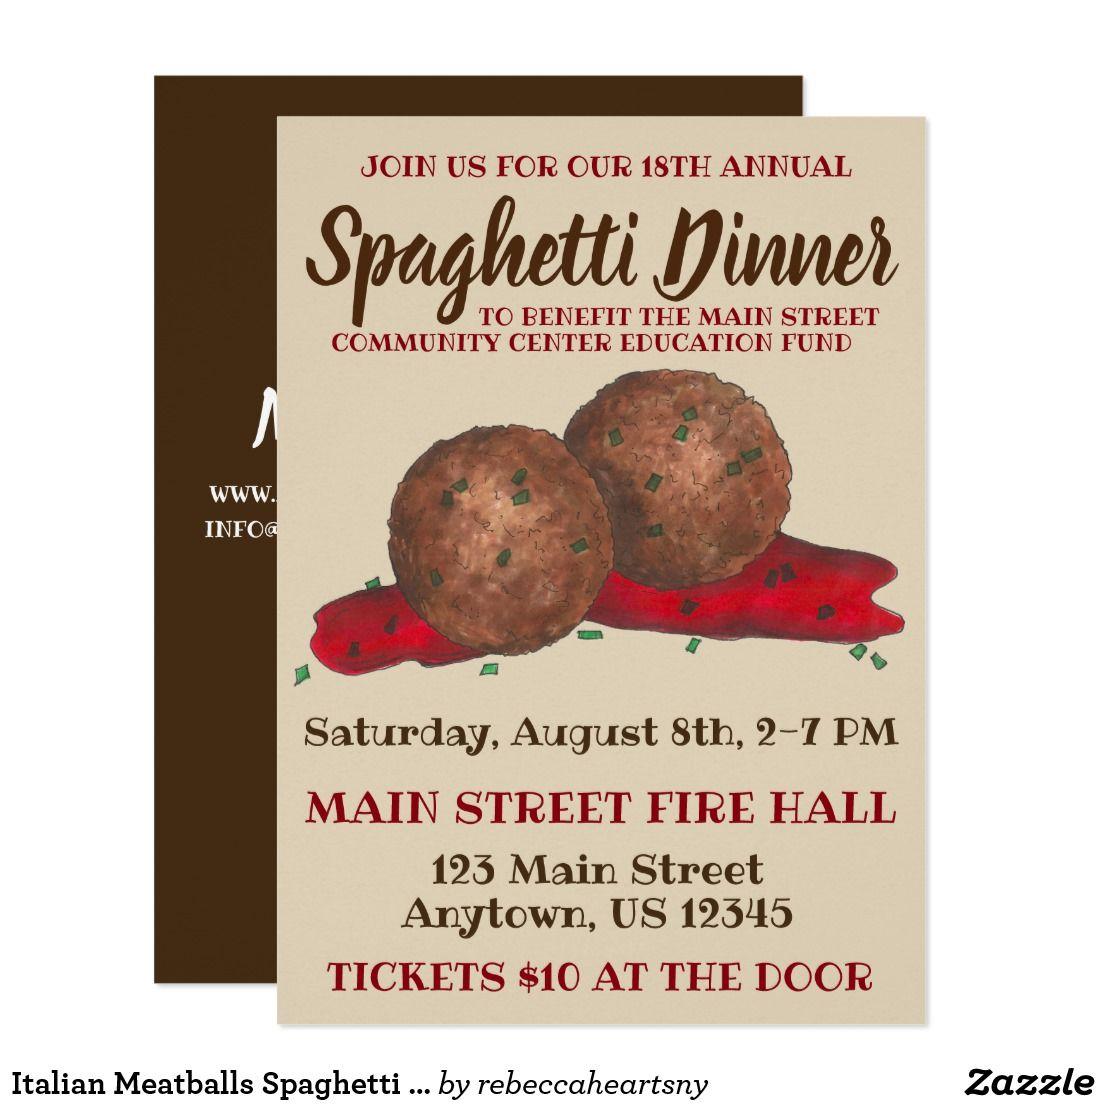 Italian Meatballs Spaghetti Dinner Charity Event